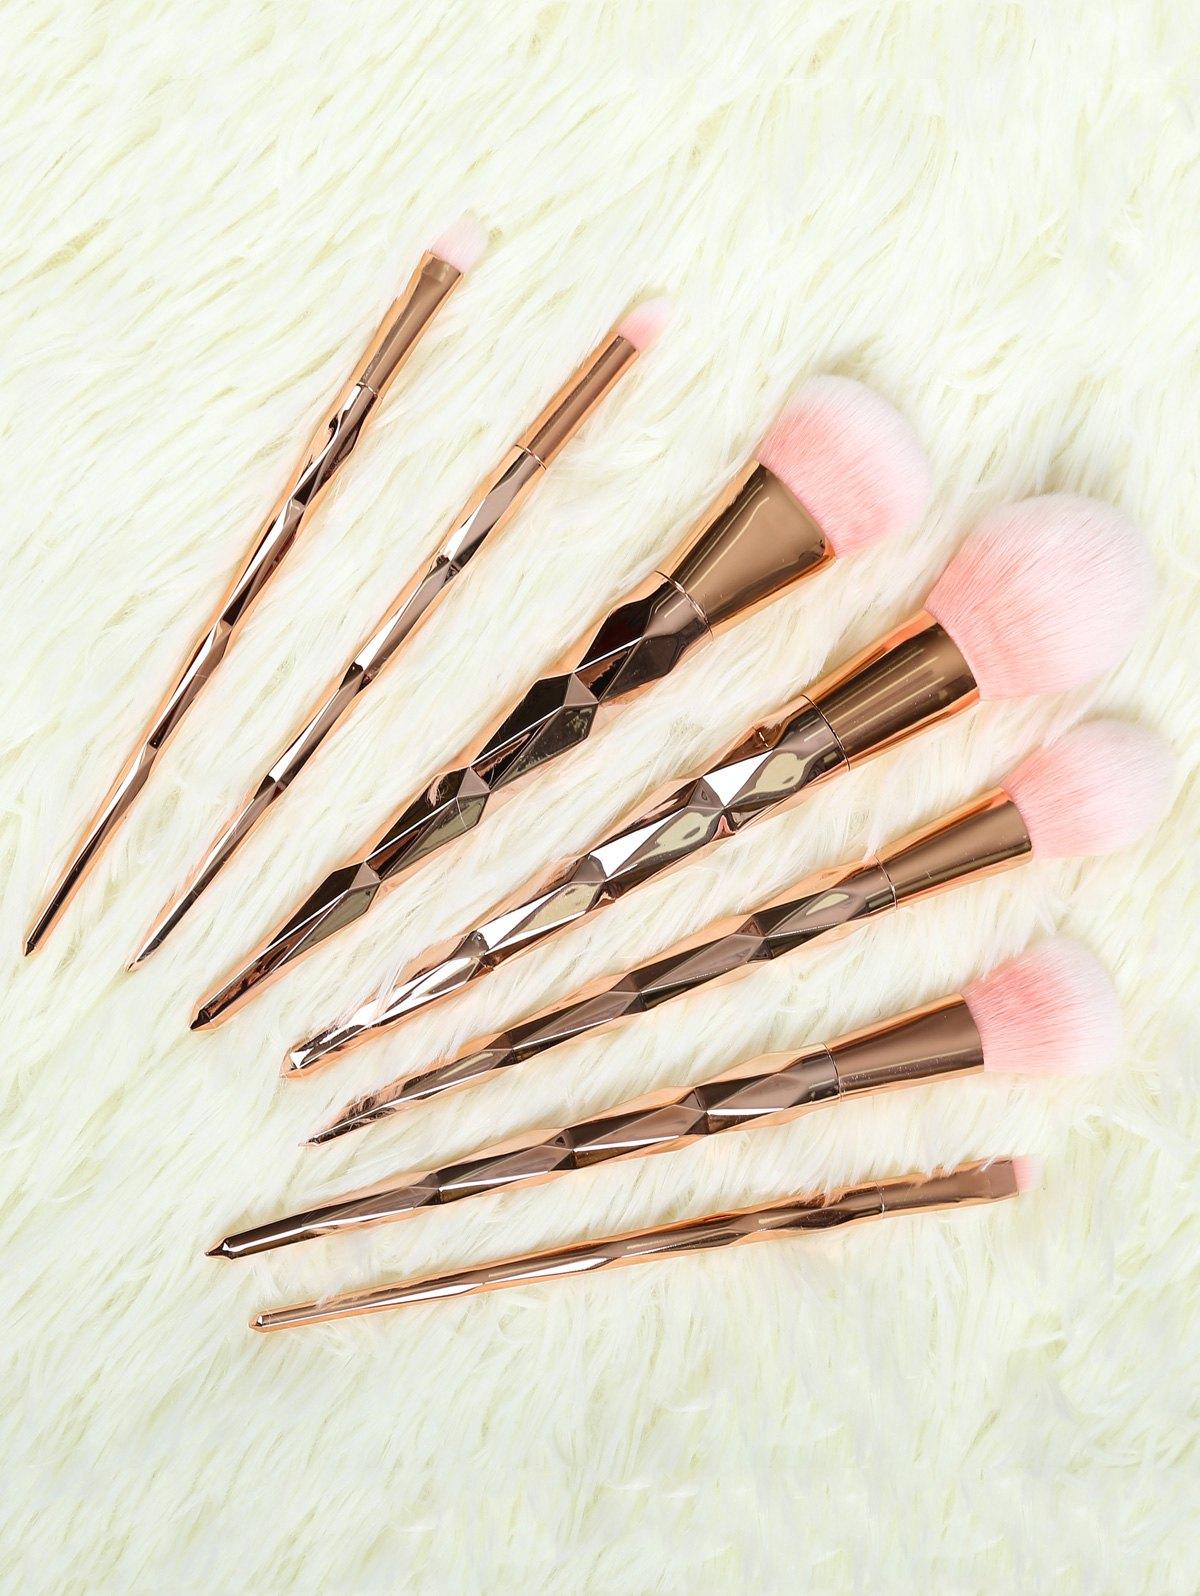 7 Pcs Rhombus Handle Nylon Makeup Brushes Set